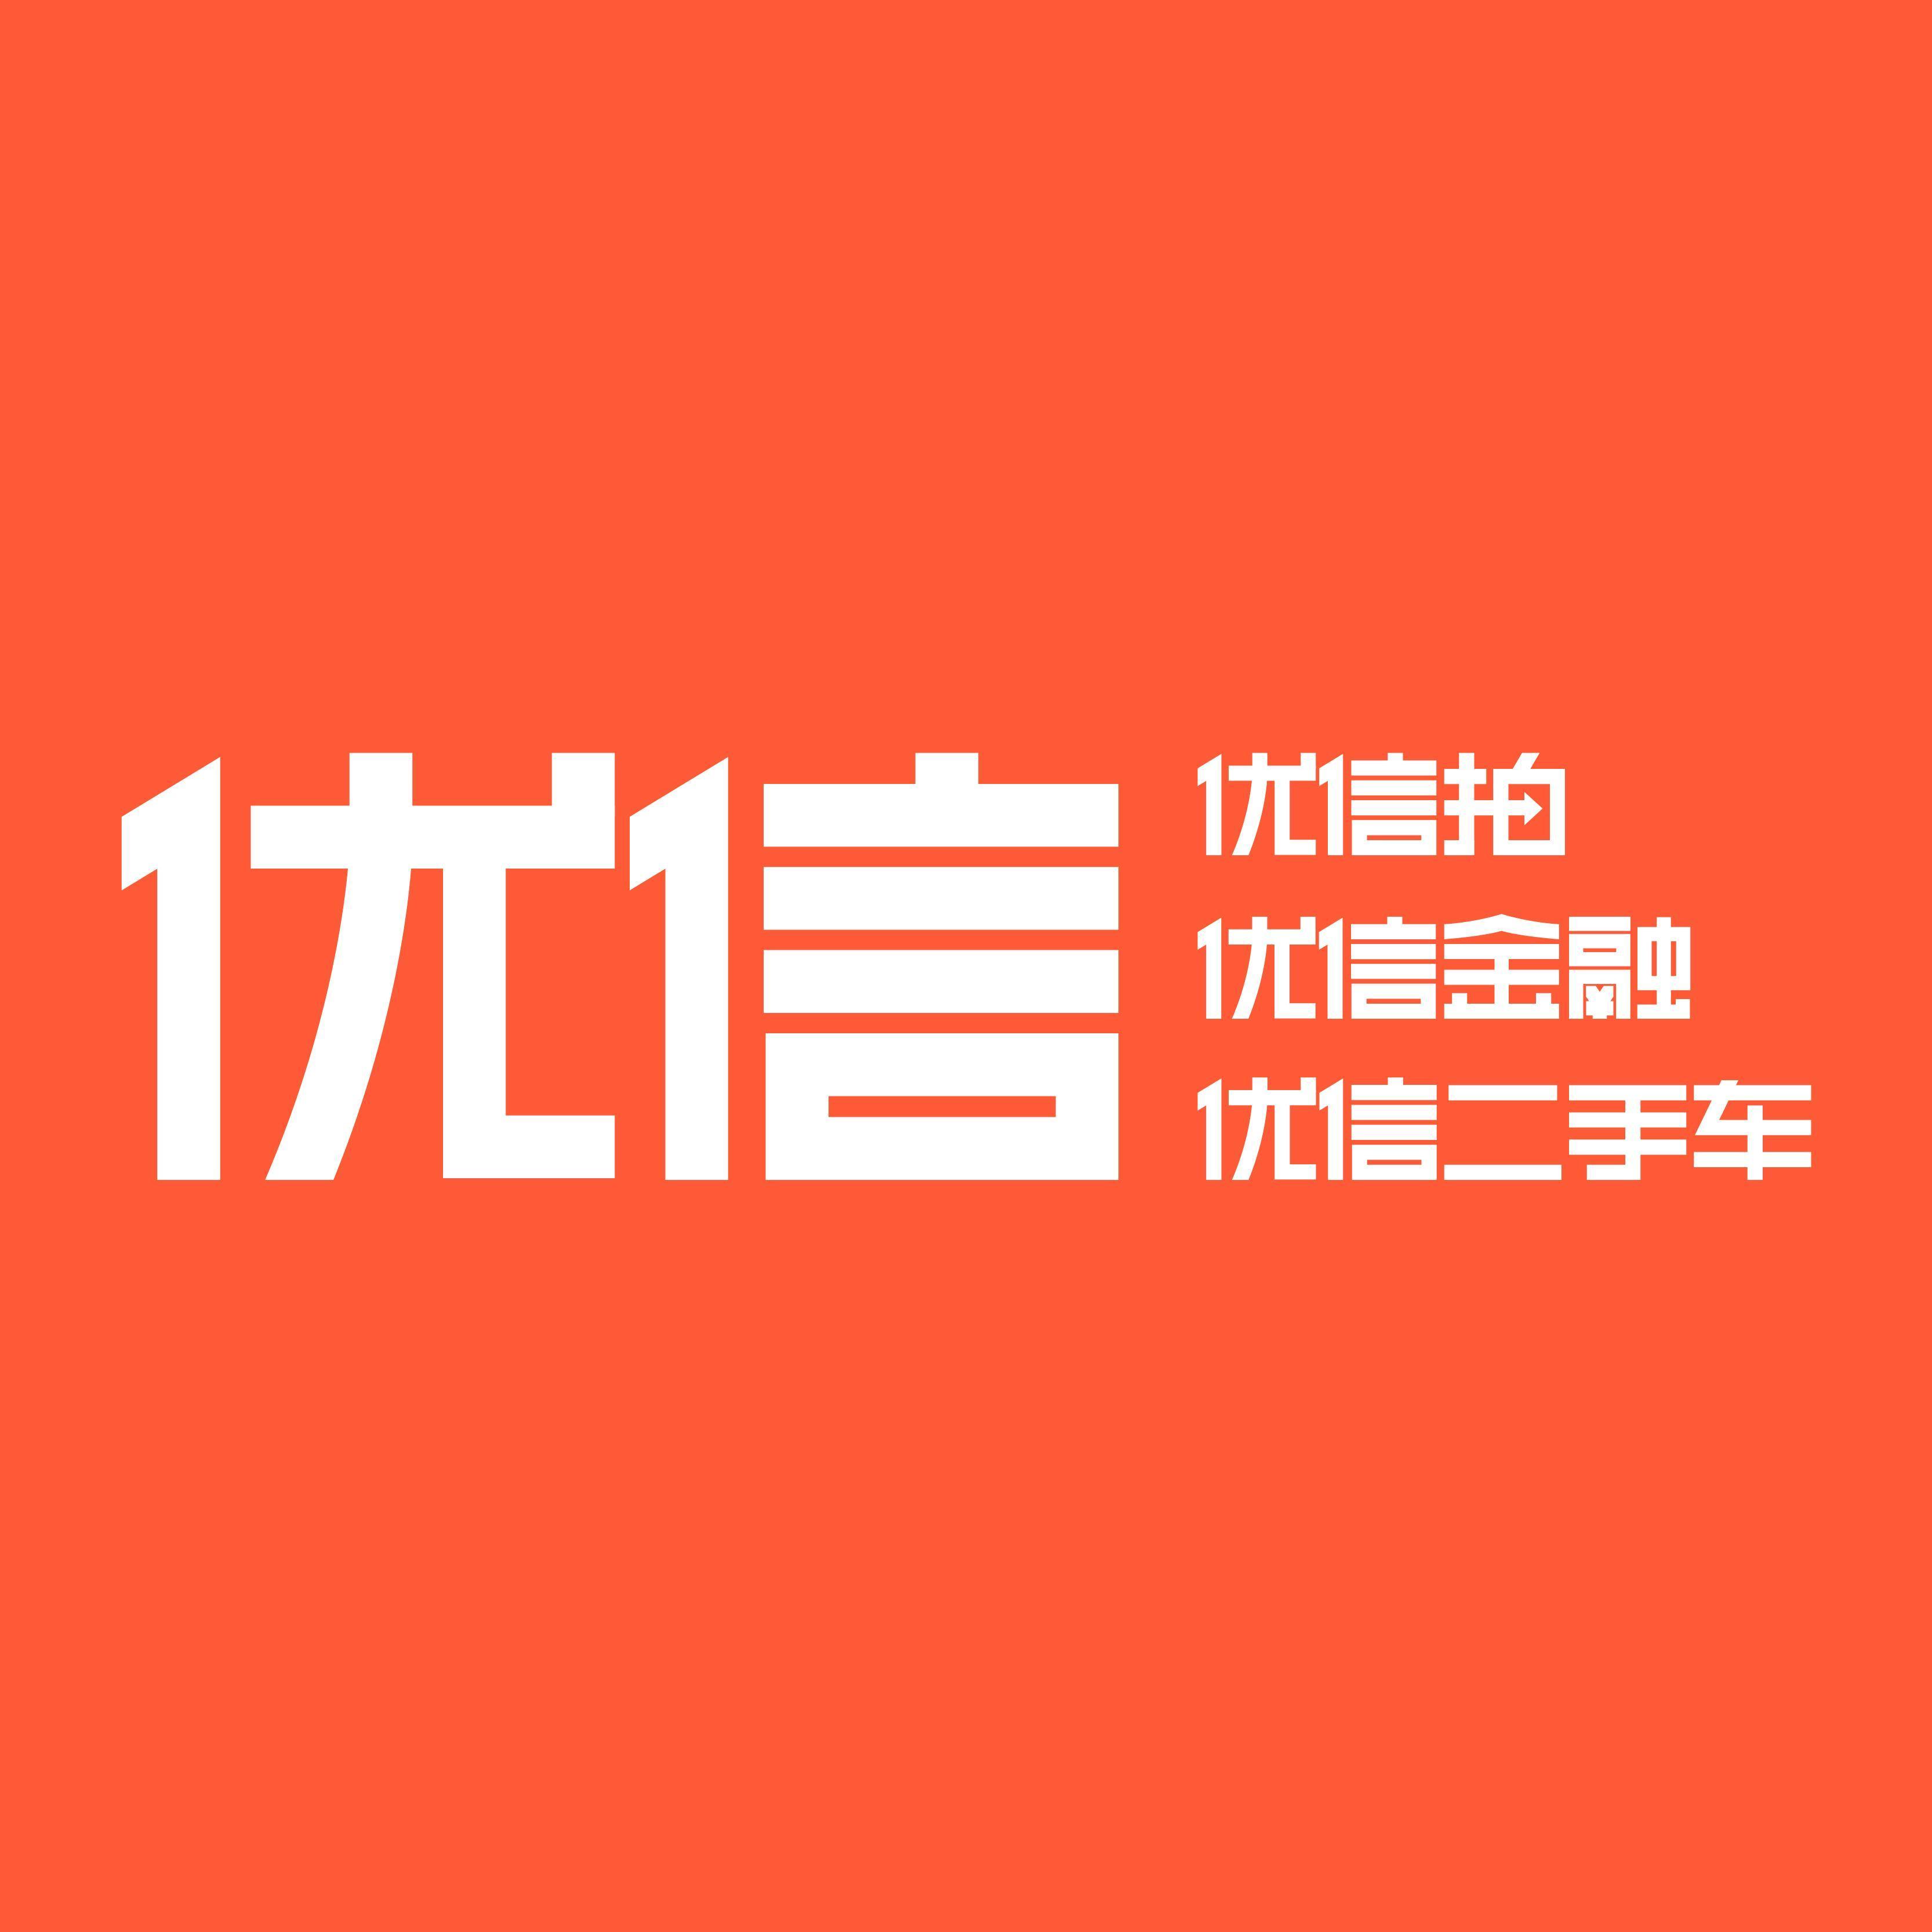 优信二手车logo